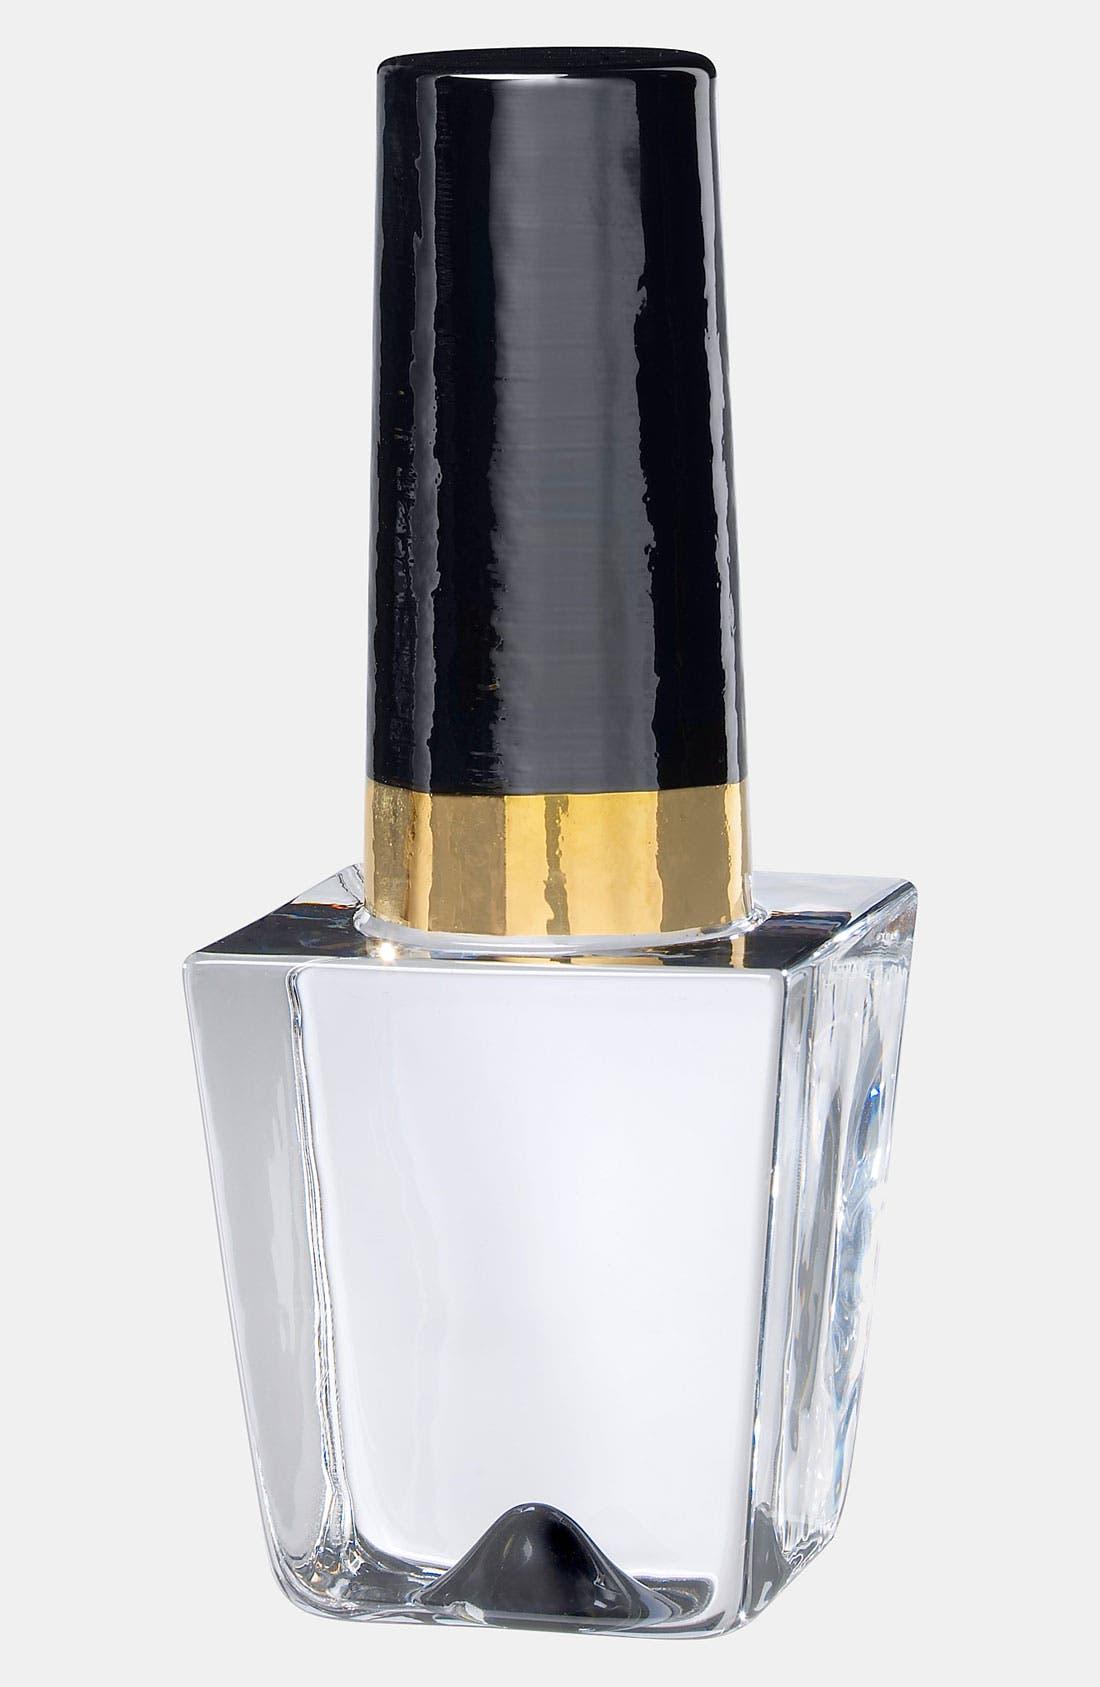 Main Image - Kosta Boda 'Makeup Nail Polish Bottle' Sculpture